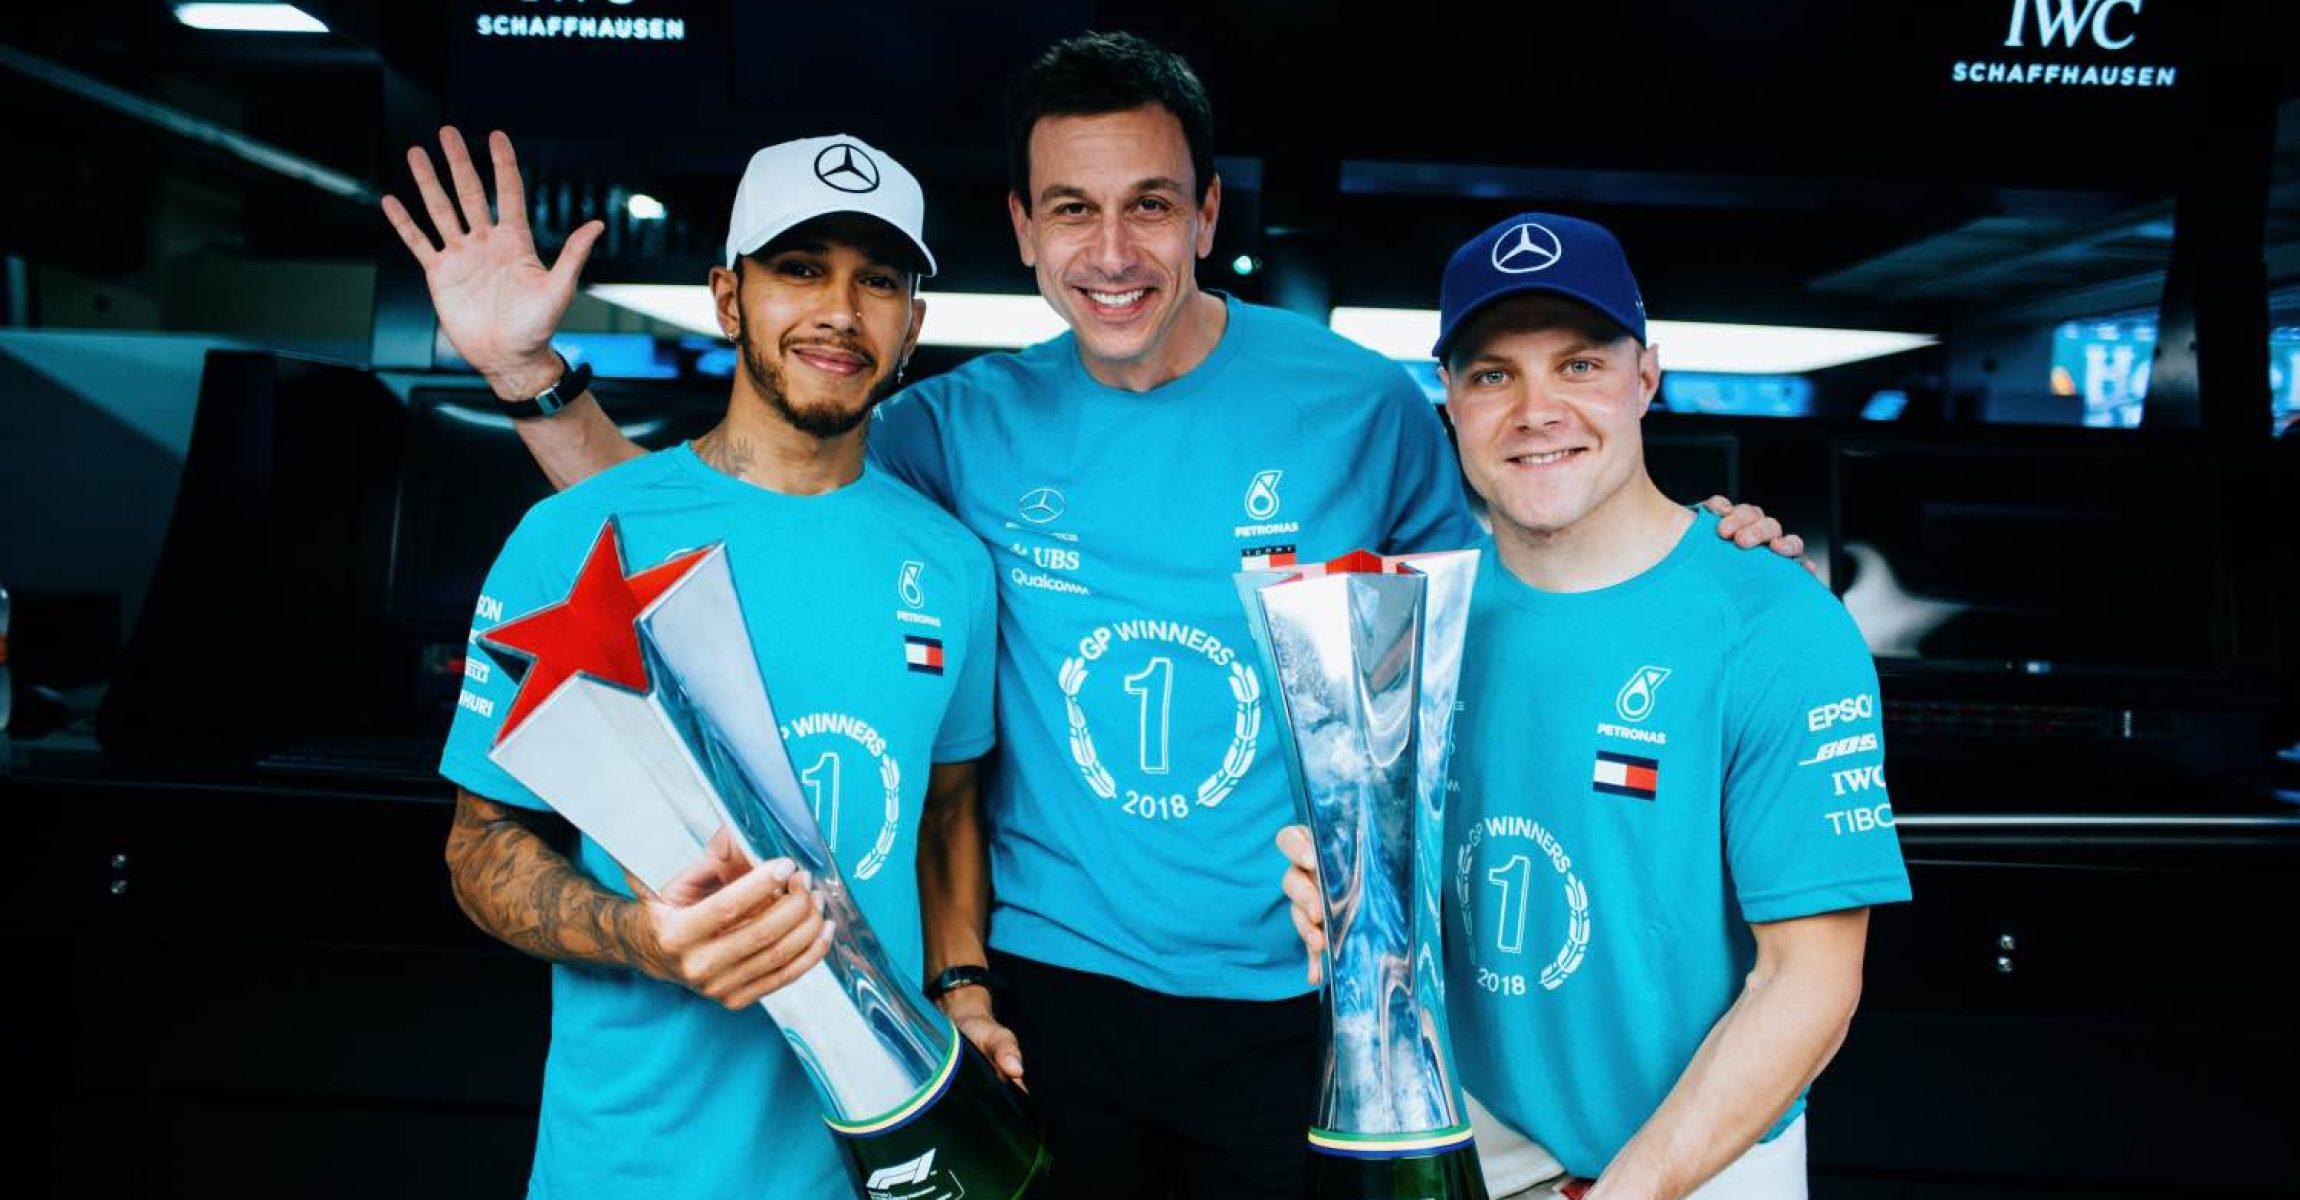 2018 Brazilian Grand Prix, Sunday - Paul Ripke Lewis Hamilton Toto Wolff, Valtteri Bottas